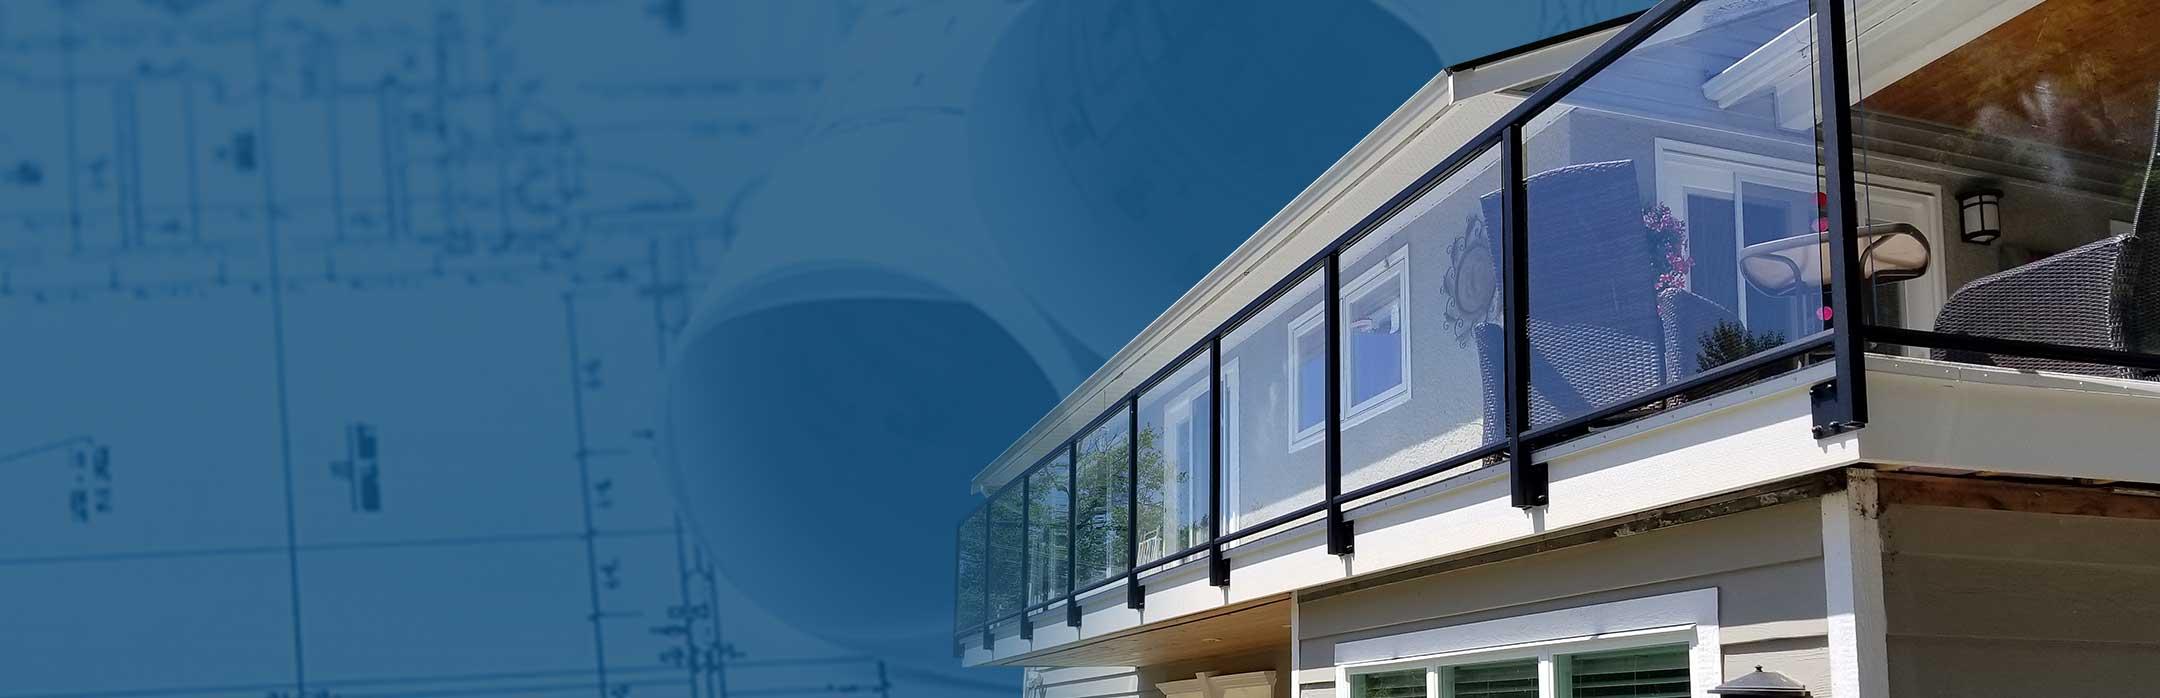 Glass Windscreens For Patios Patio Windscreens Outdoor